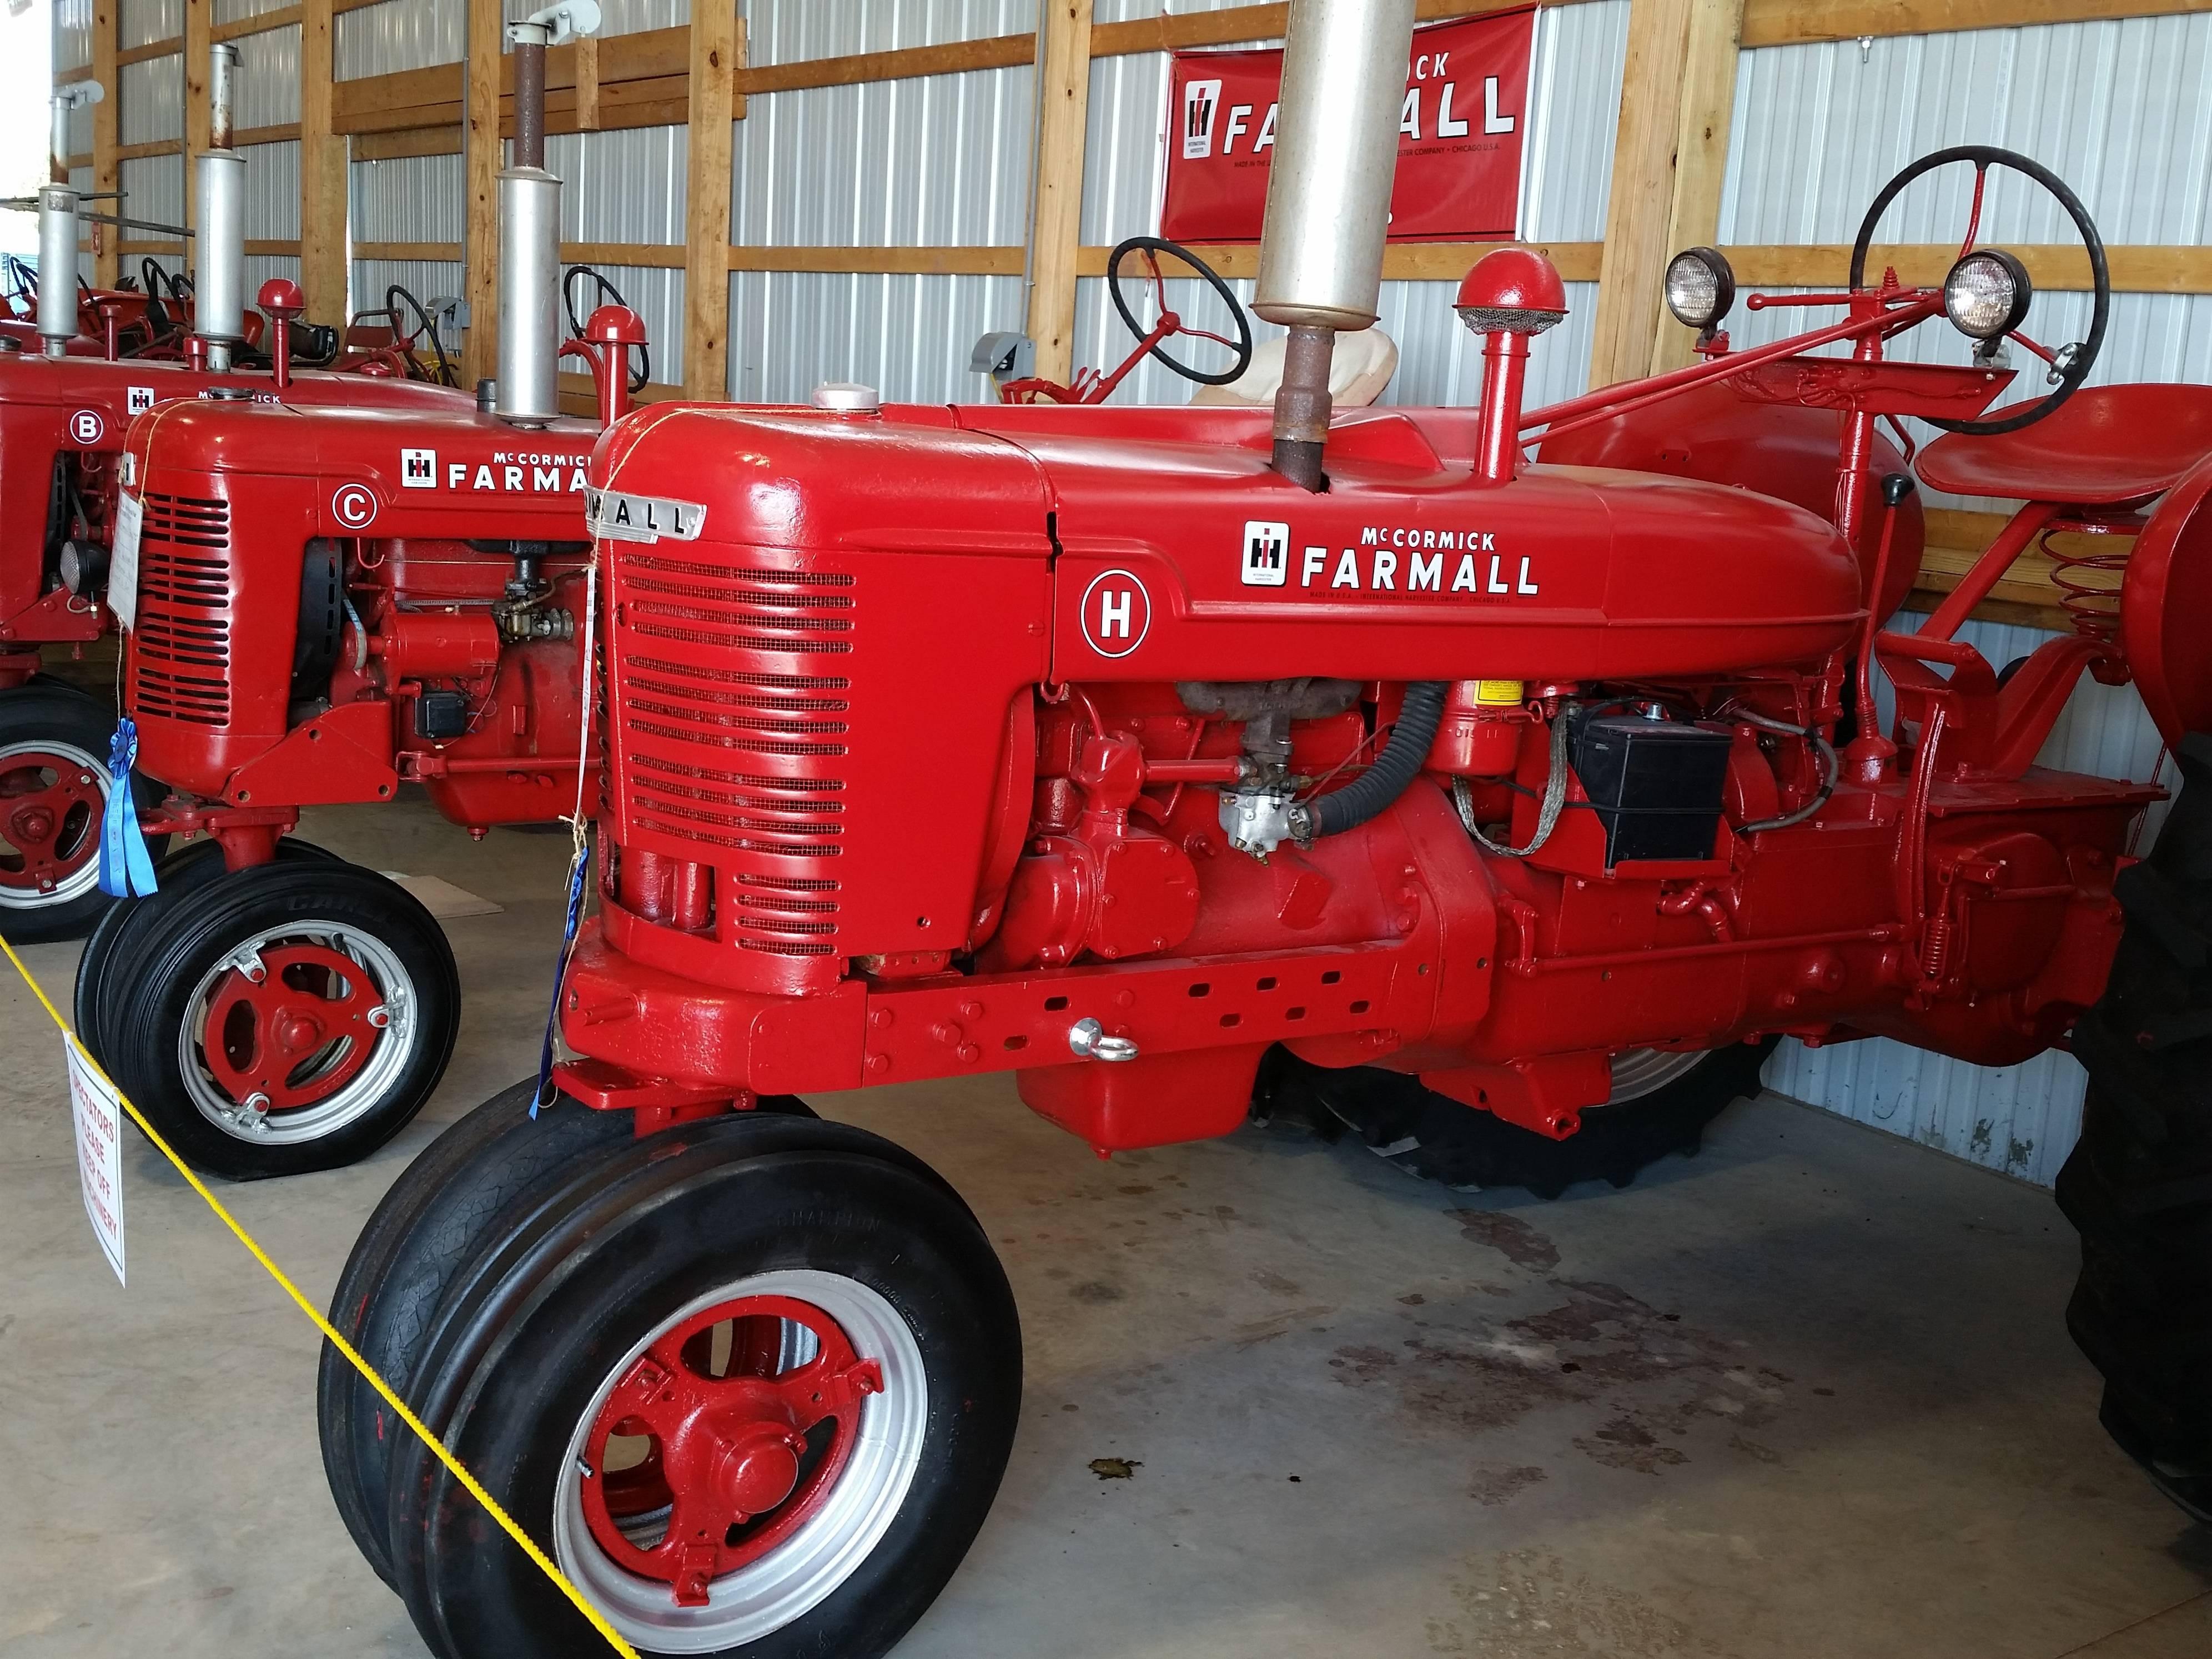 c7827385beafd2350431_TractorBarn2016Farmall.JPG